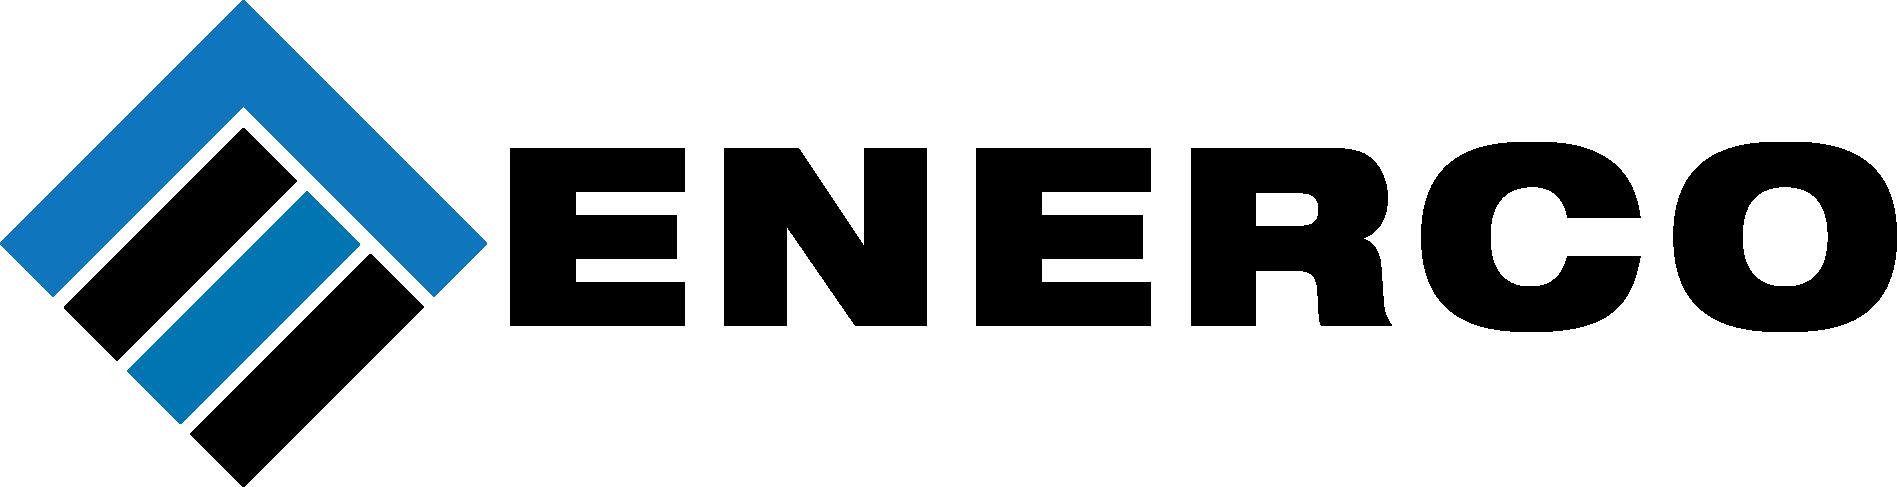 Propane Bulk Tank Adapter (Male POL x 1in20 Male Throwaway Cyl Threads) Clamshell